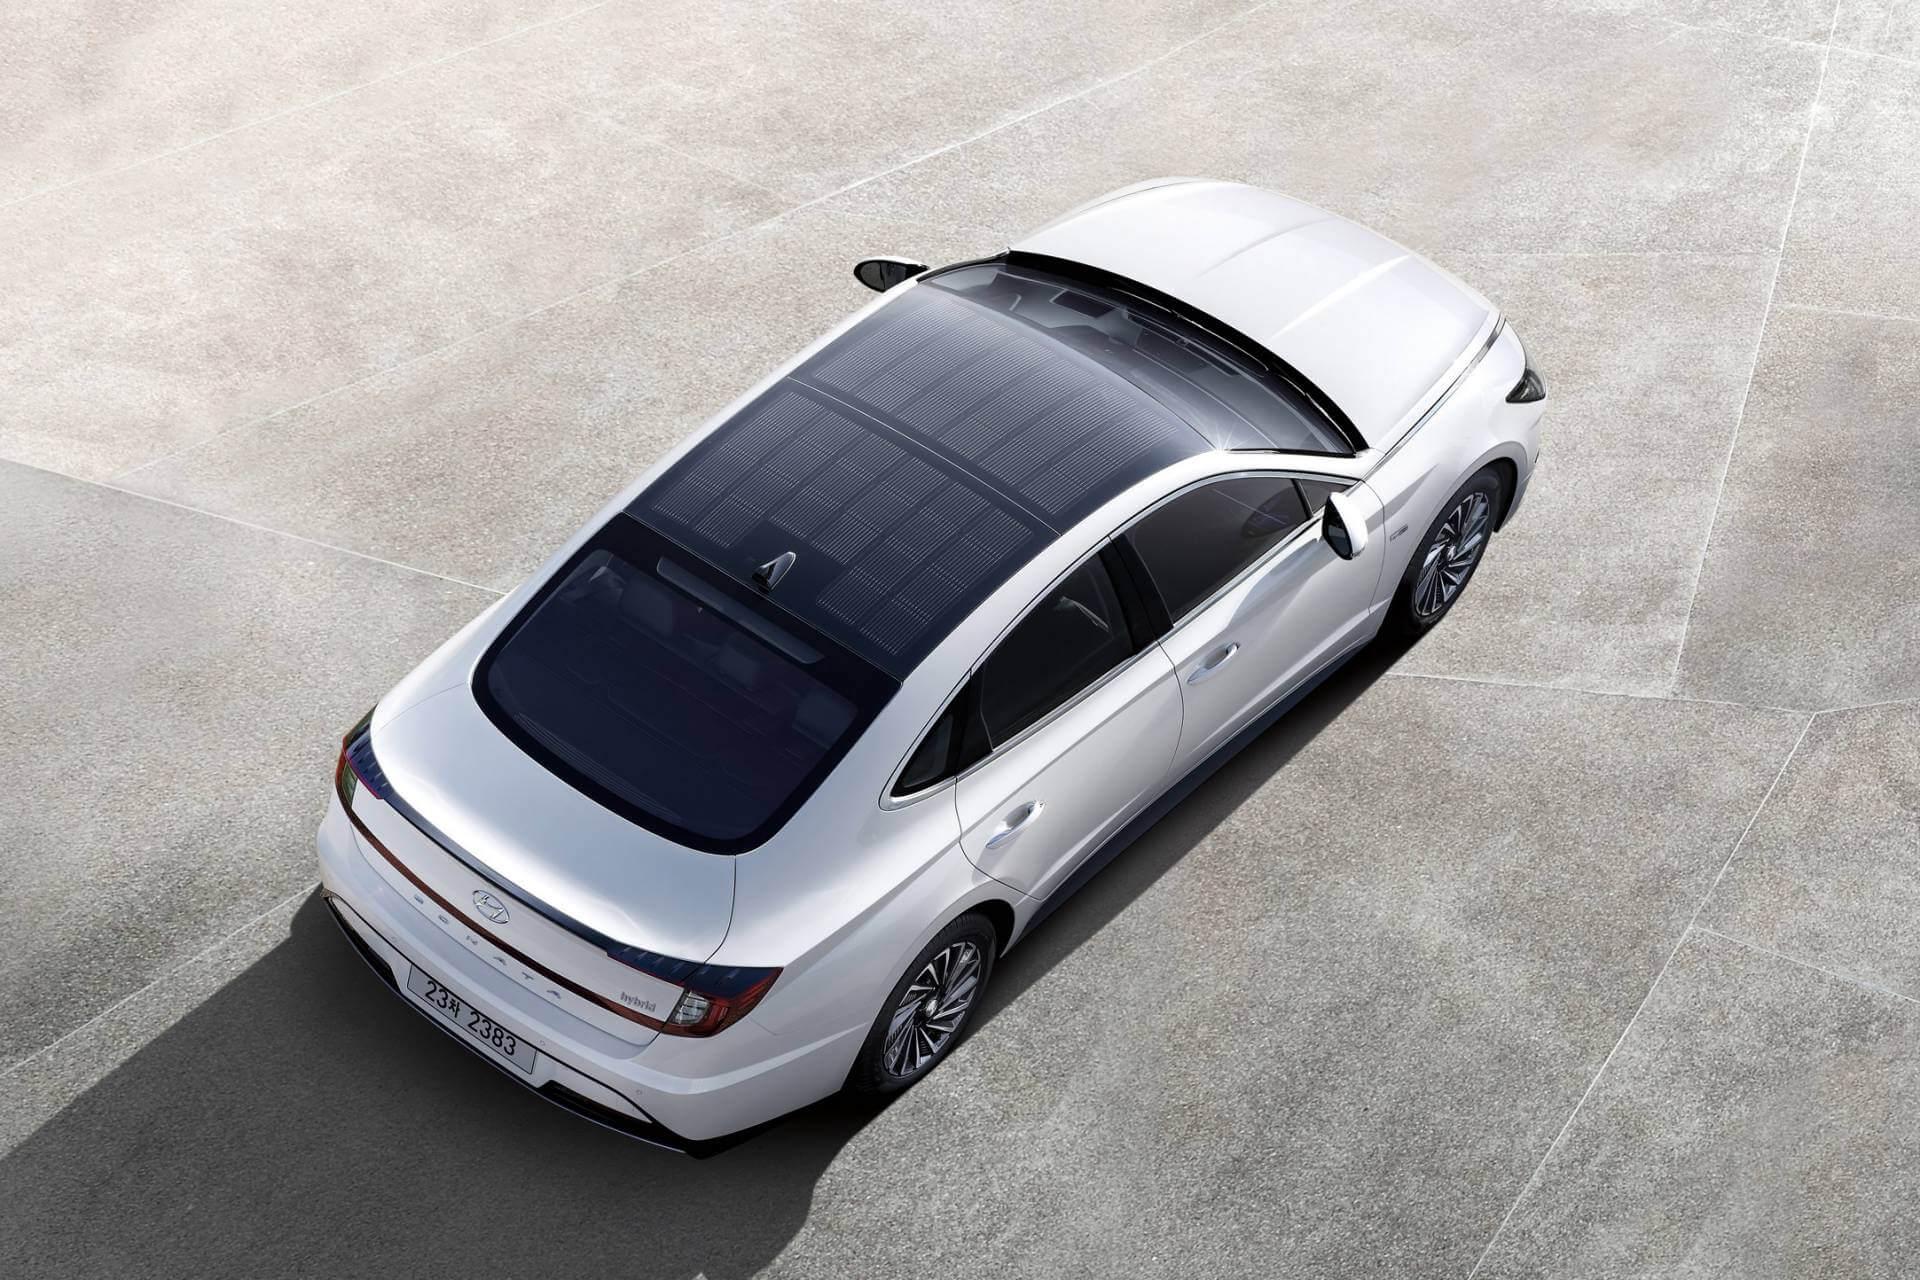 Hyundai Sonata Hybrid 2020 с солнечными панелями на крыше